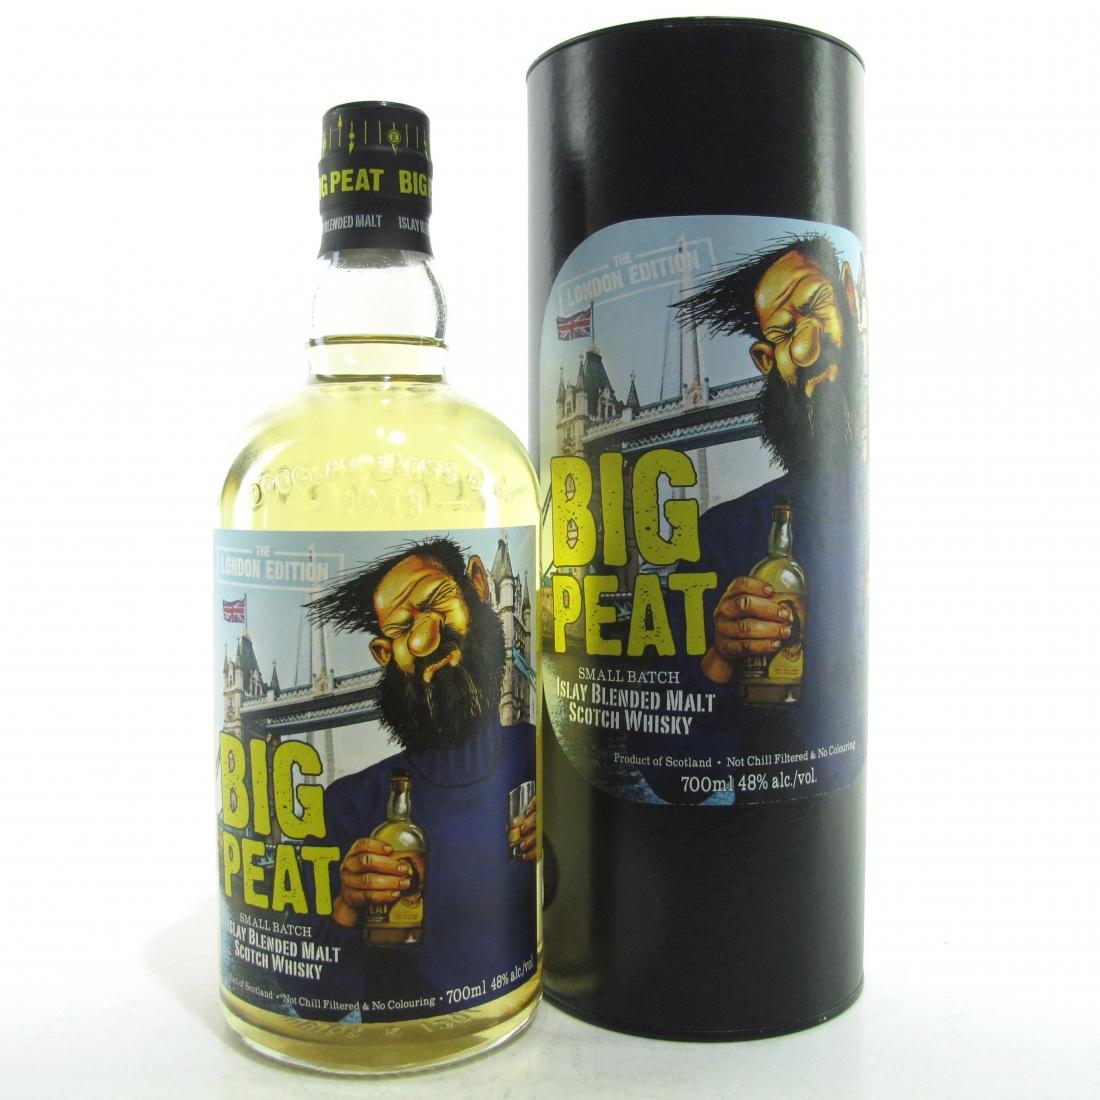 Big Peat The London Edition